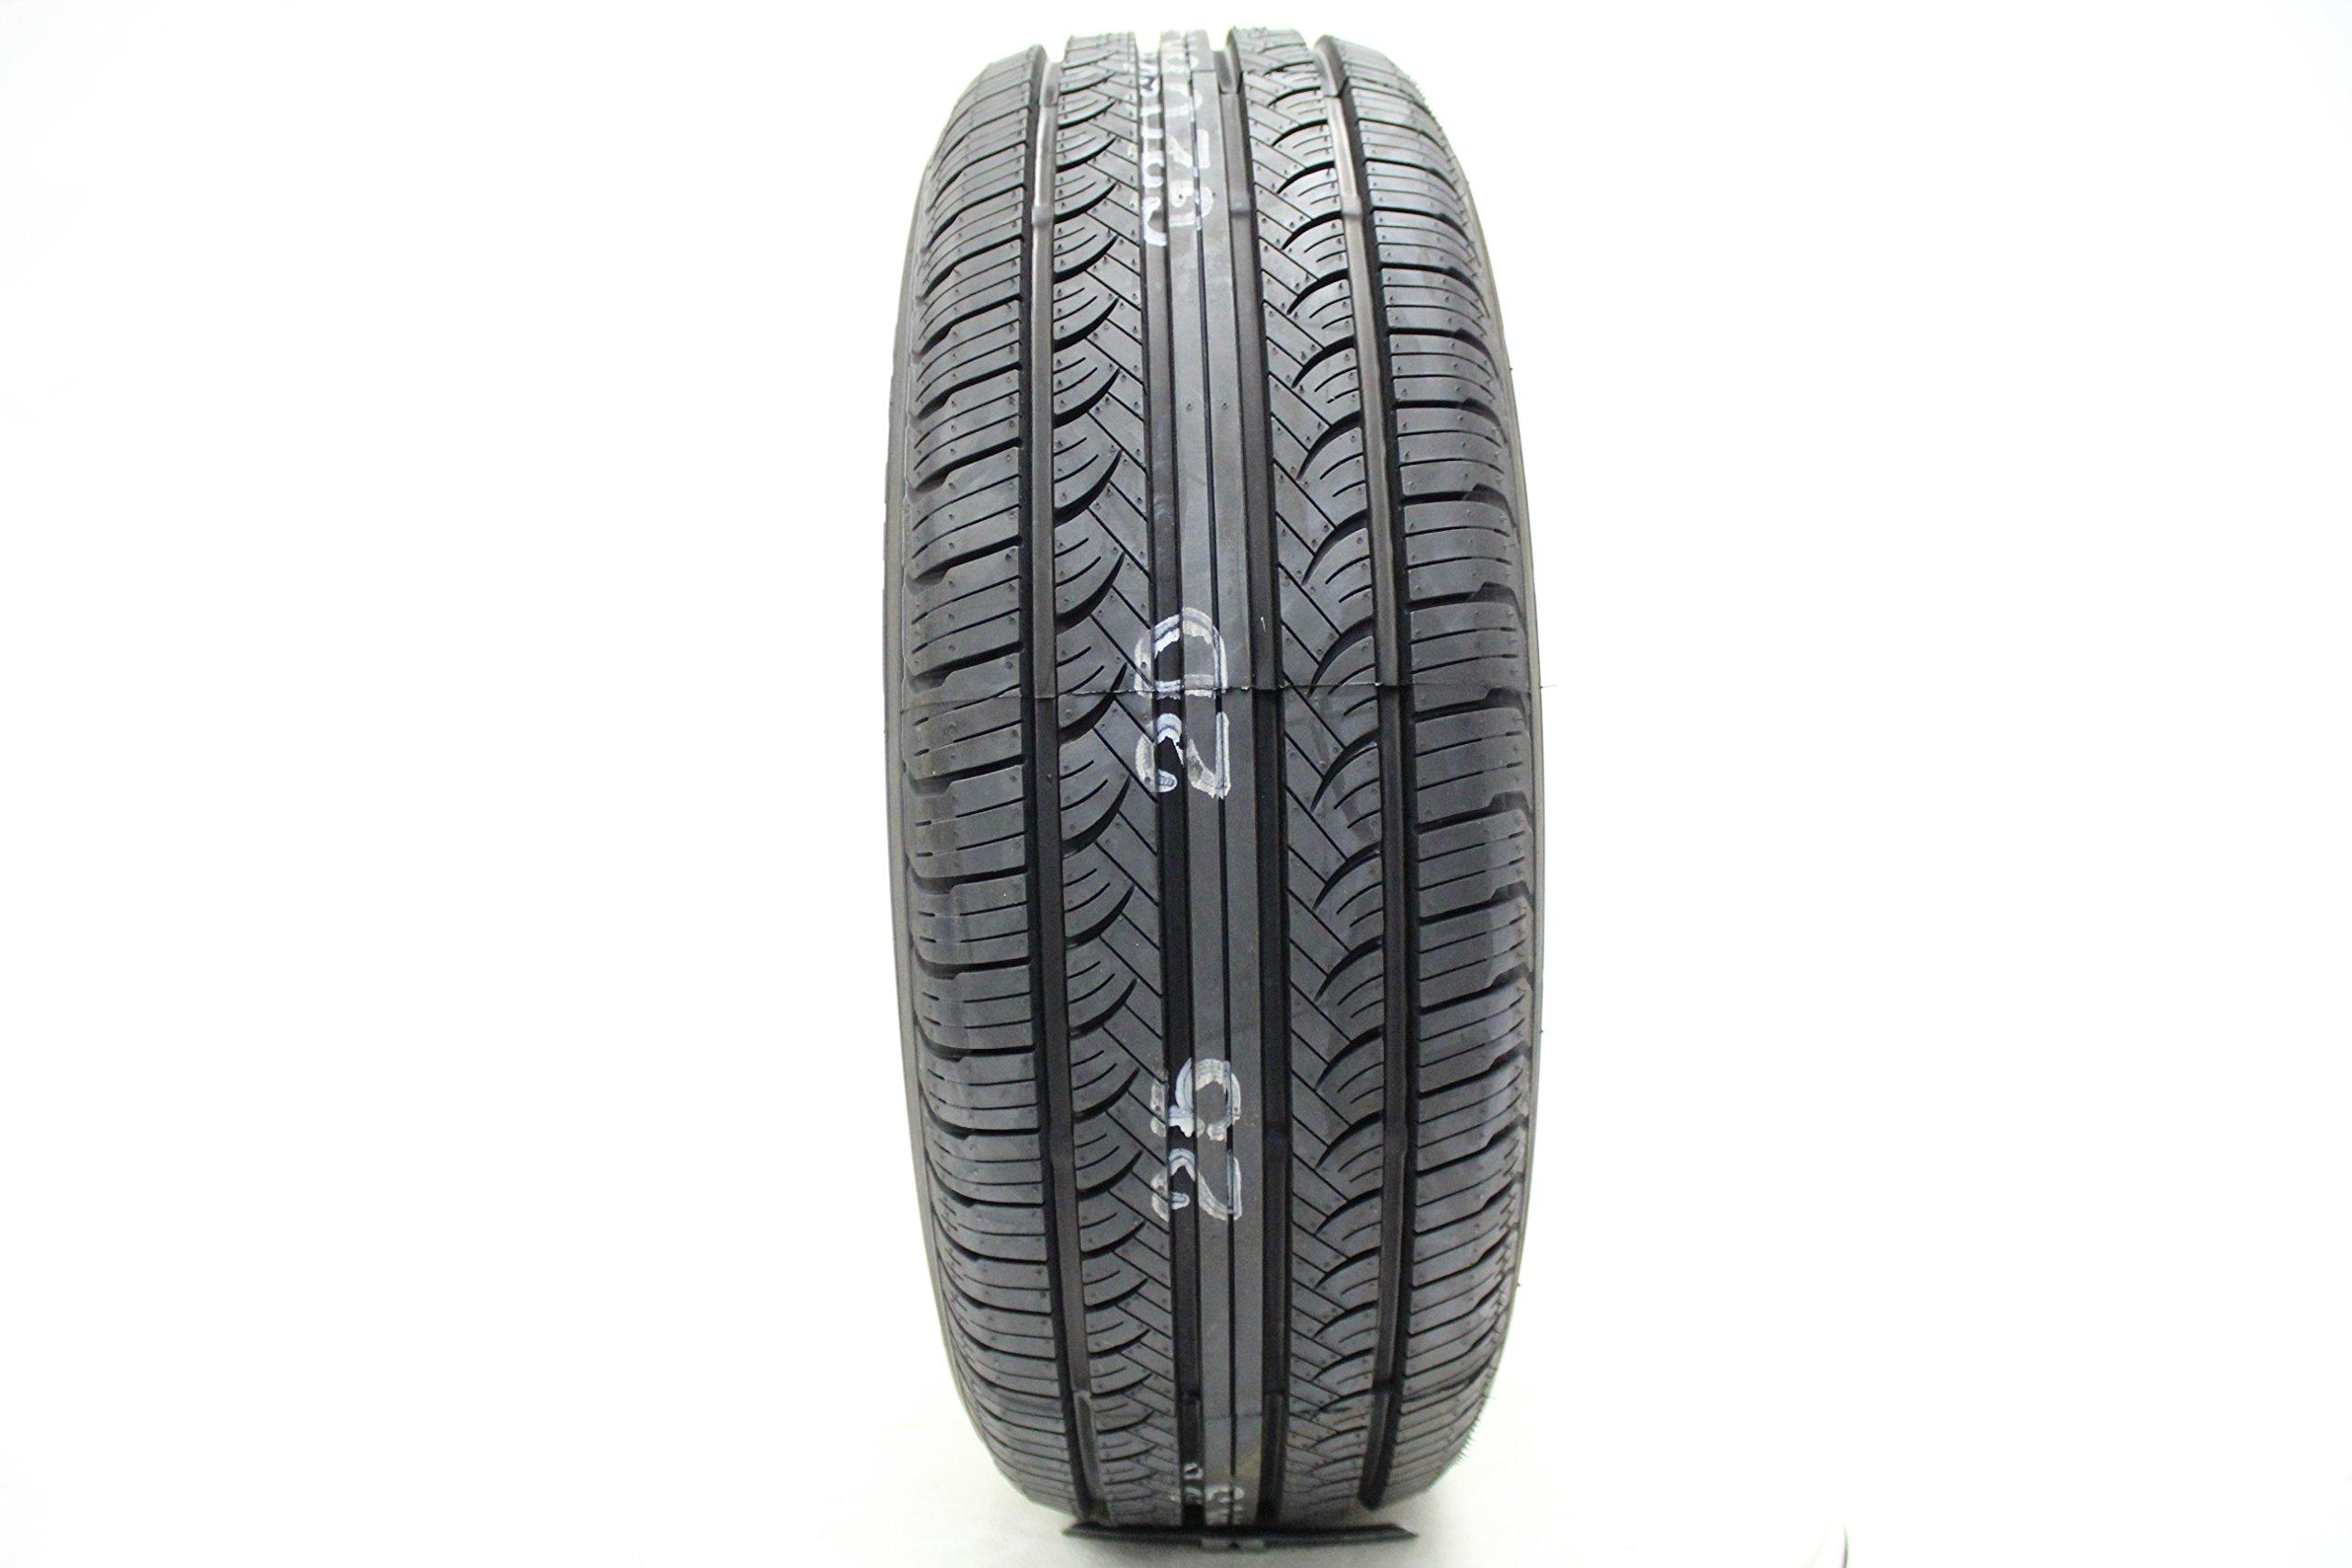 Yokohama Avid Touring S All-Season Tire - 215/60R16 94T